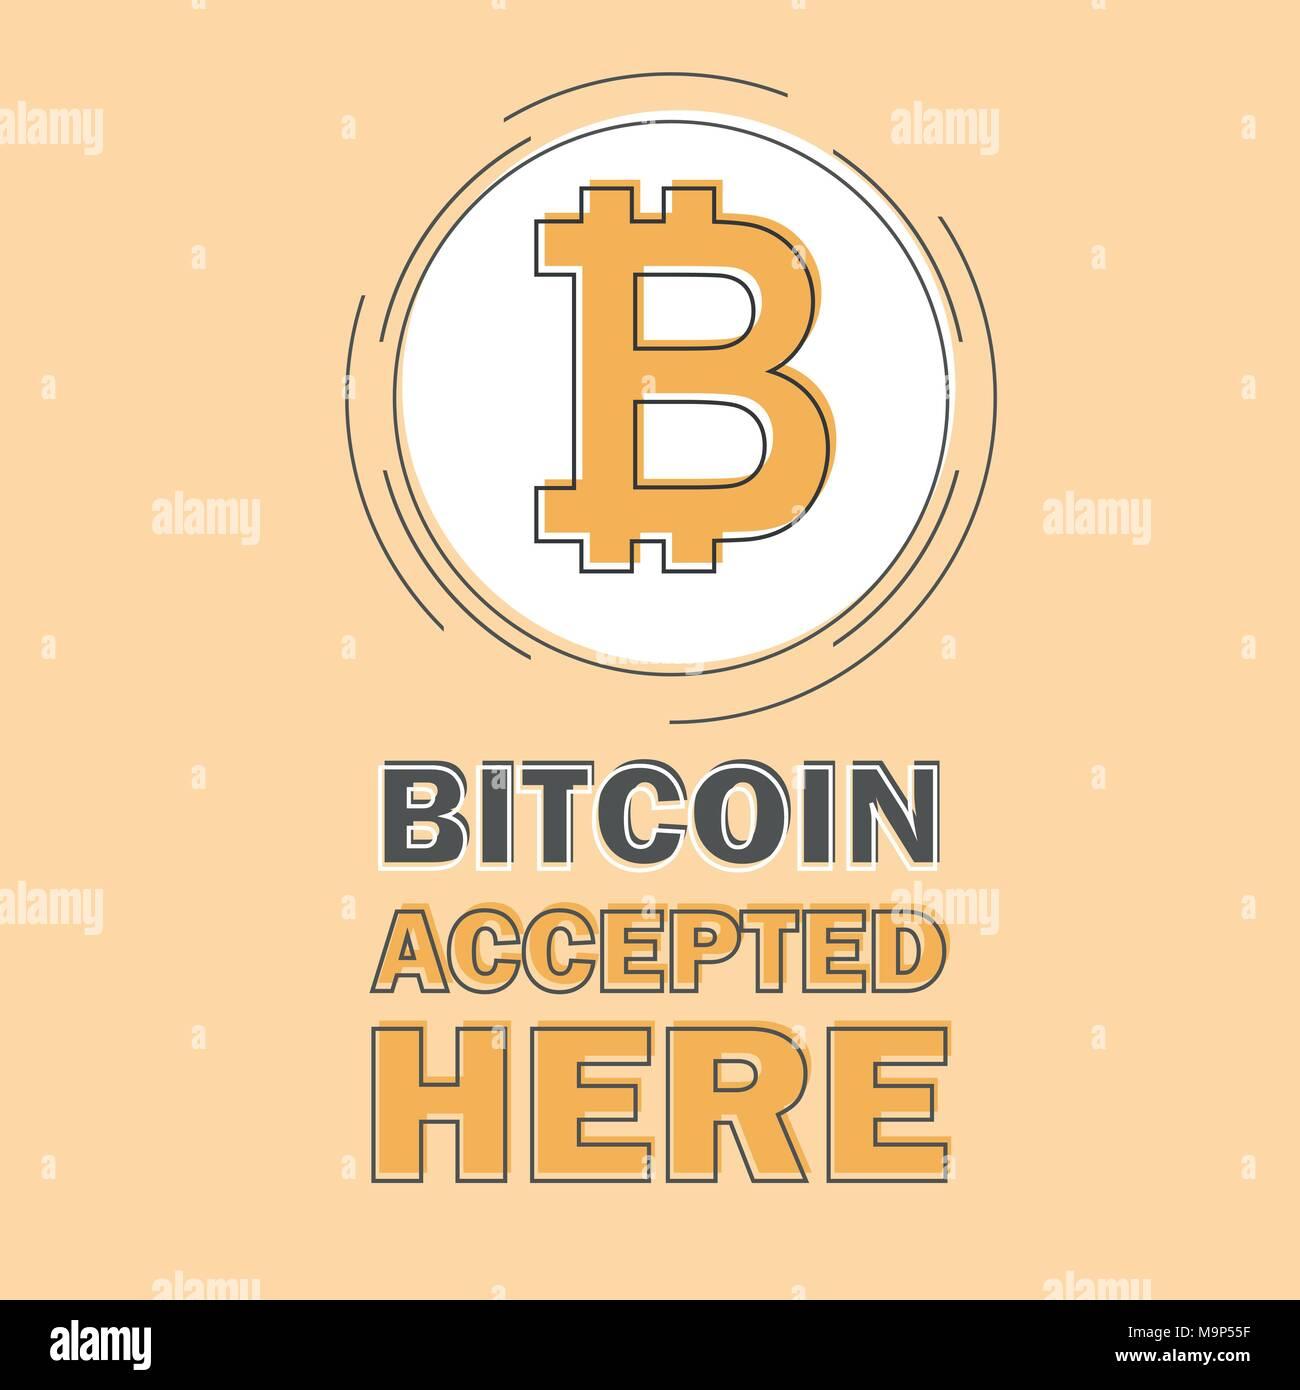 Bitcoins accepted logo designs three ball golf betting app